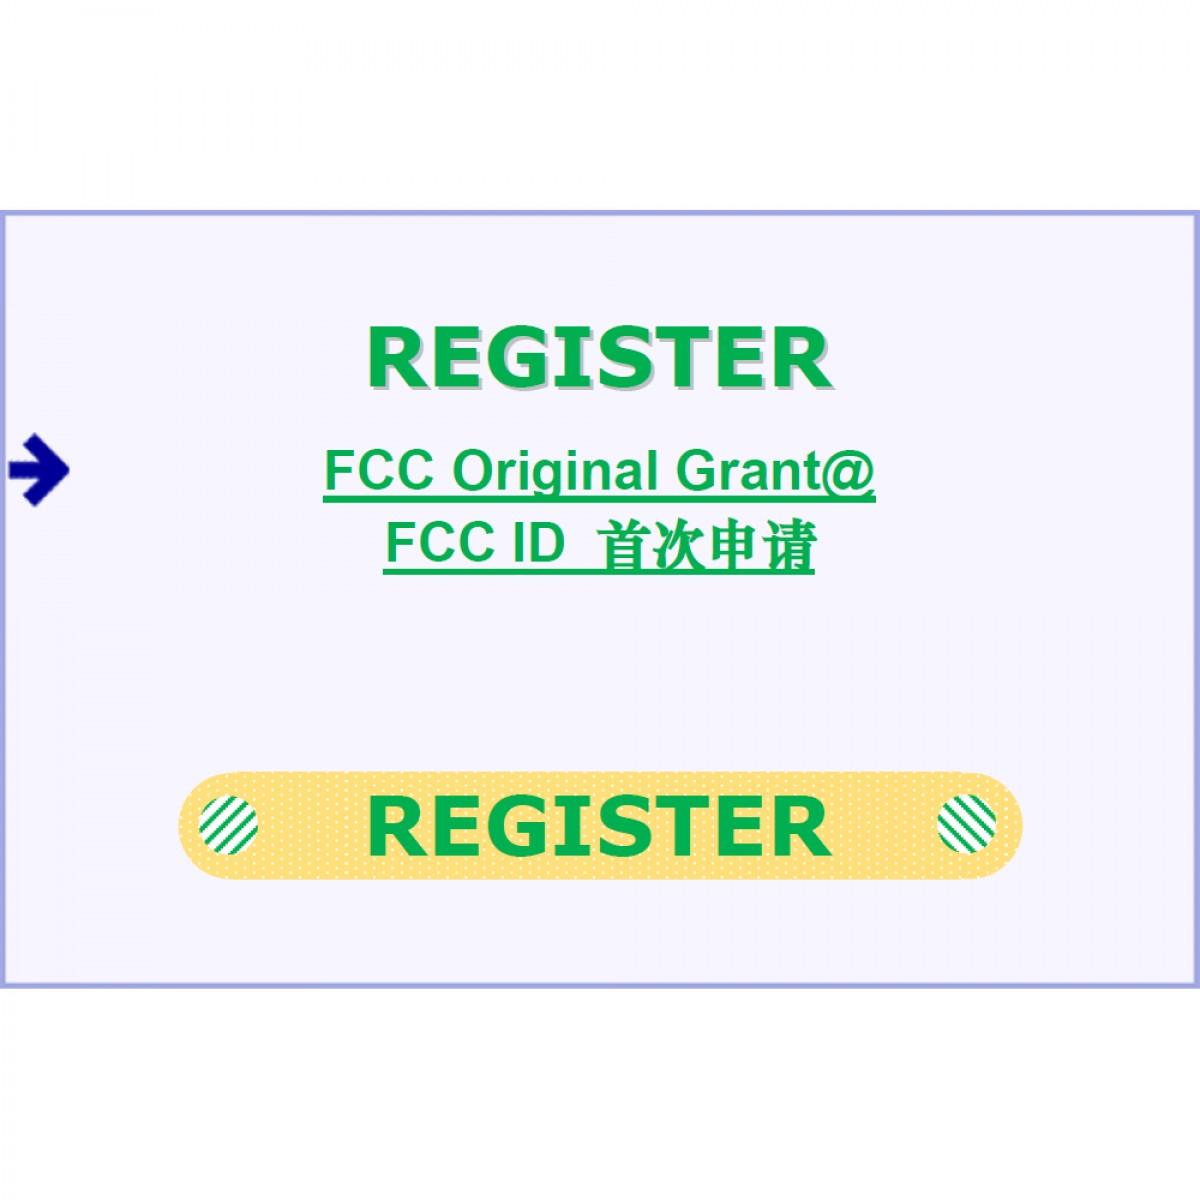 FCC Original Filing Fee with Handling Fee -> New Single Certification_Single Mode Device_8CC/JBC/JBP@首次单型号申请_单模装置